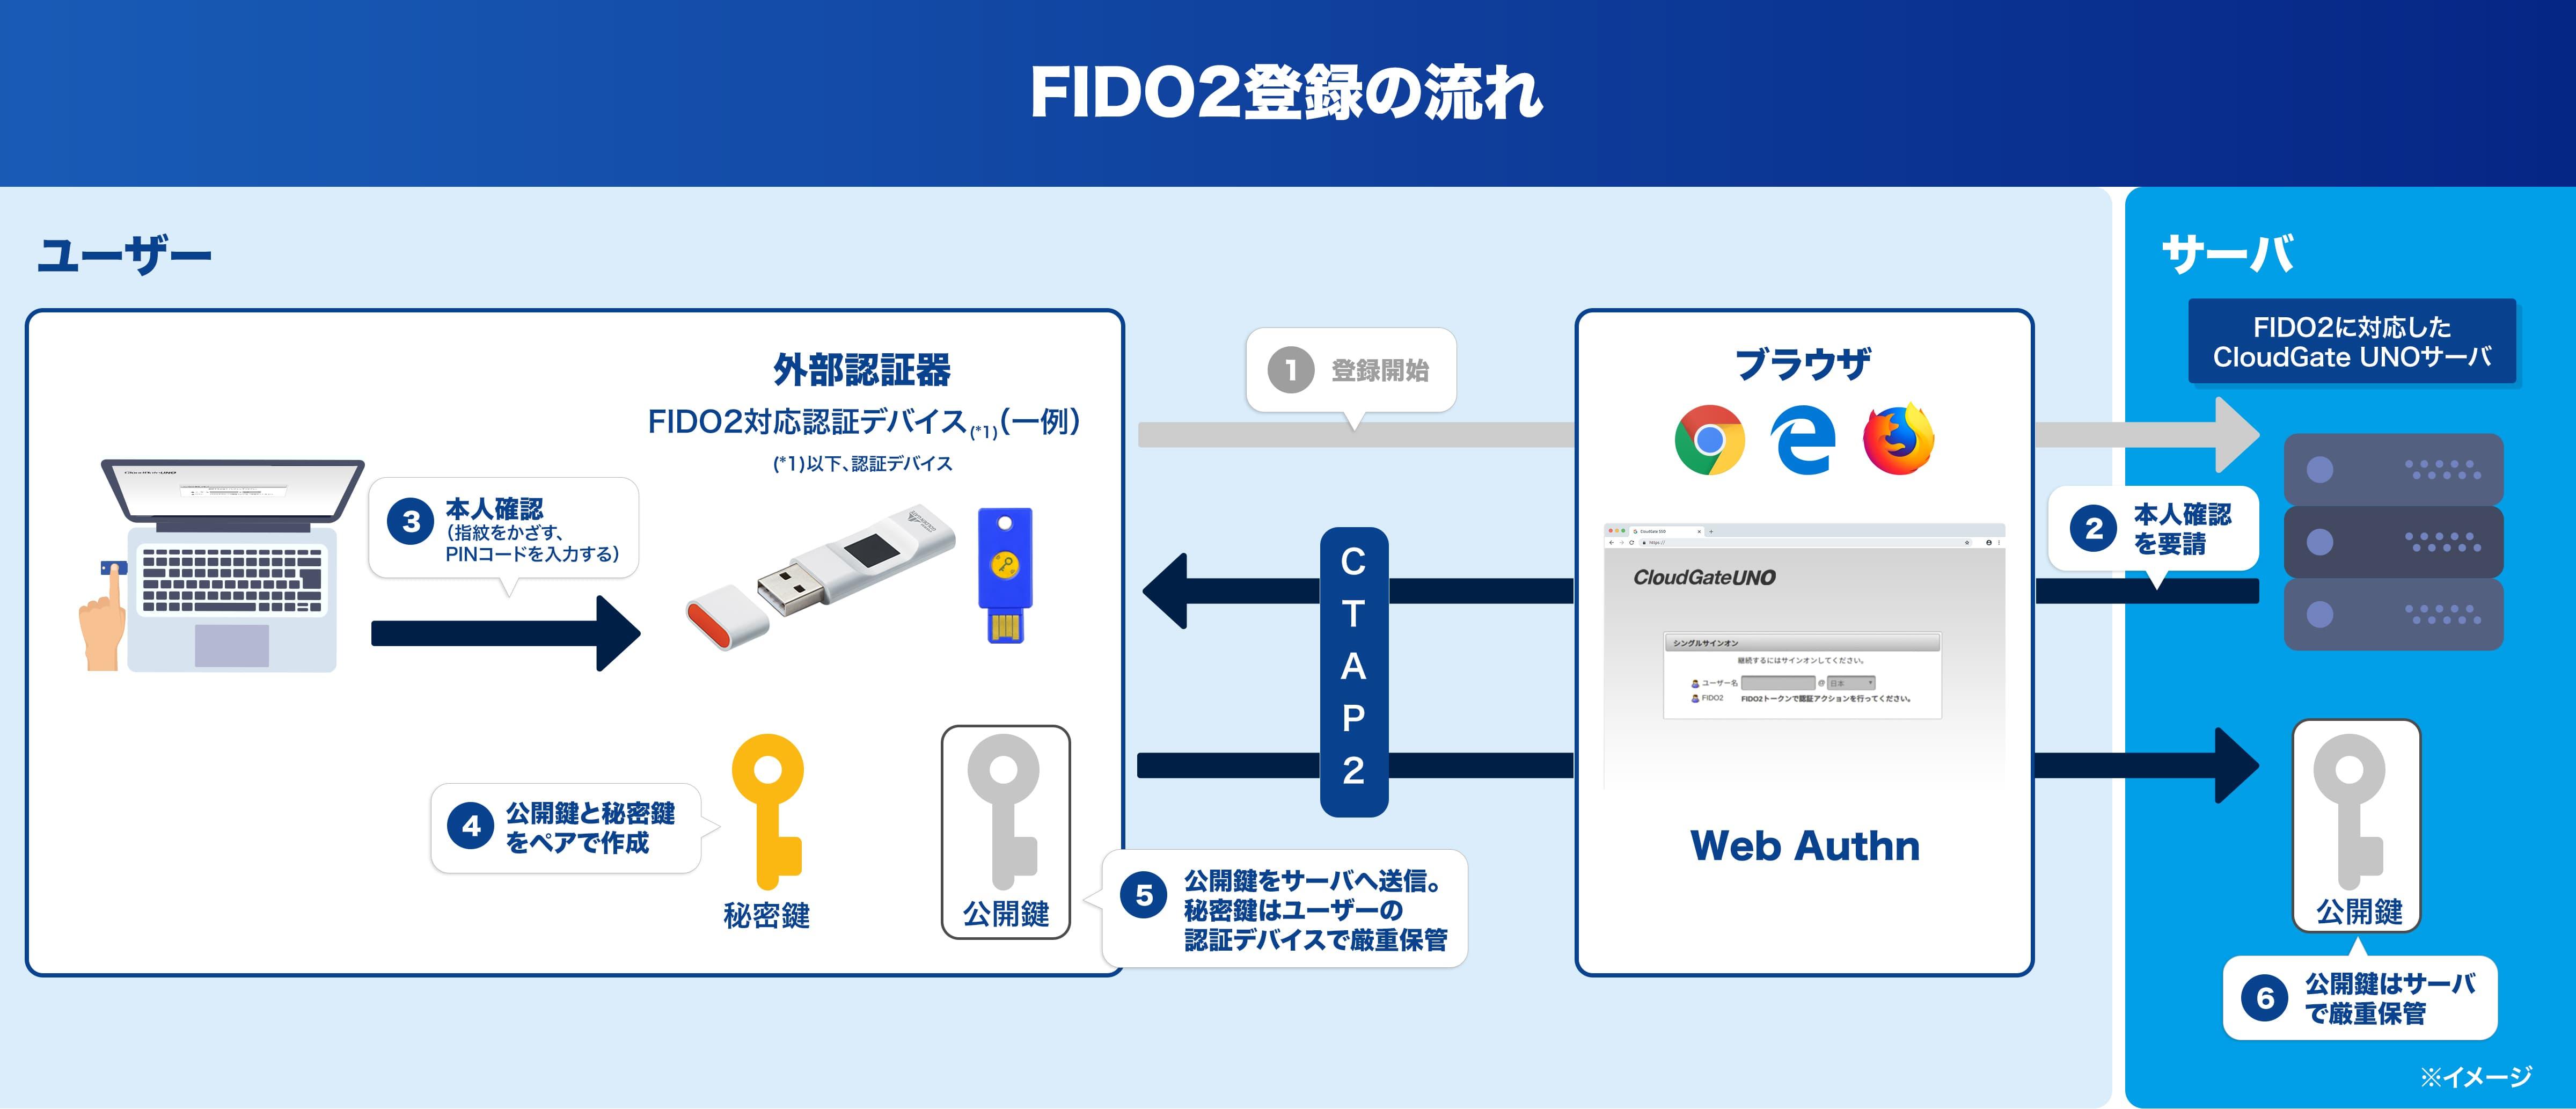 FIDO2登録の流れと認証の流れ - FIDO2 Flow Diagram - sequence 1